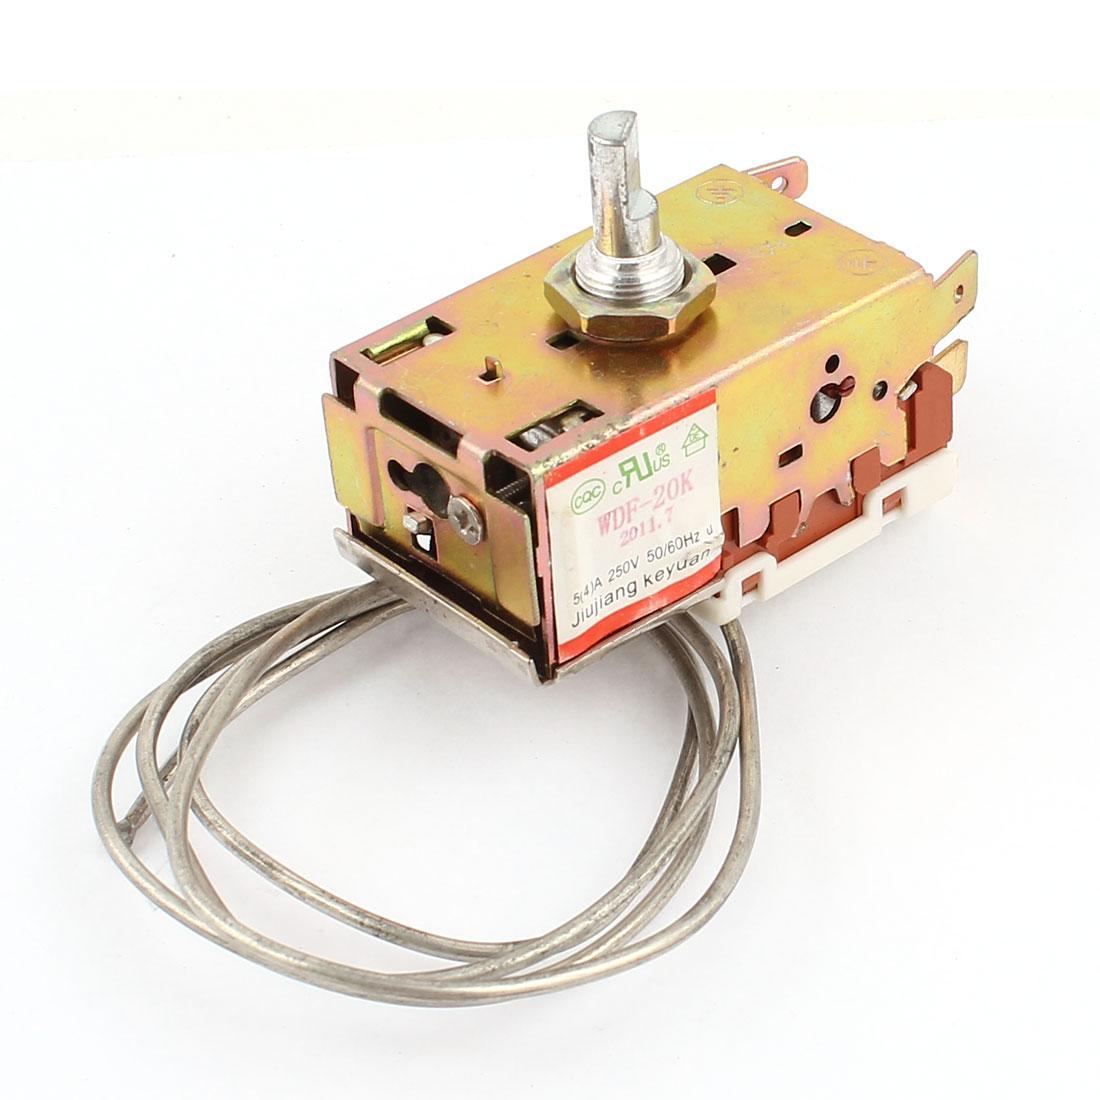 AC250V 4A Temperature Controller 72cm Cord Refrigerator Thermostat